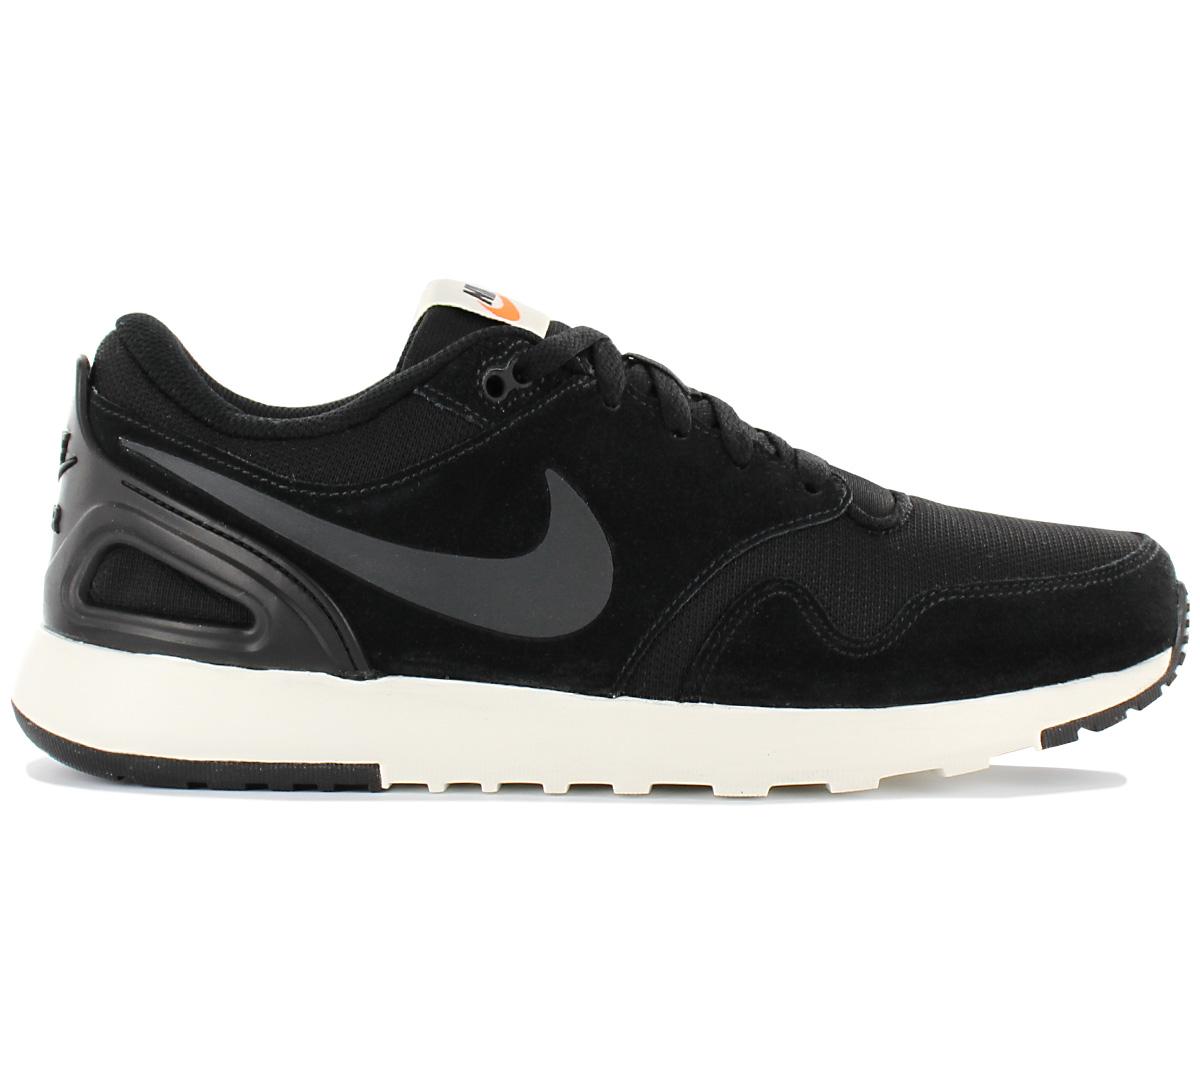 online retailer ea47b e84cd Nike Air Vibenna Men s Sneakers Fashion Shoes Sneakers Leisure ...